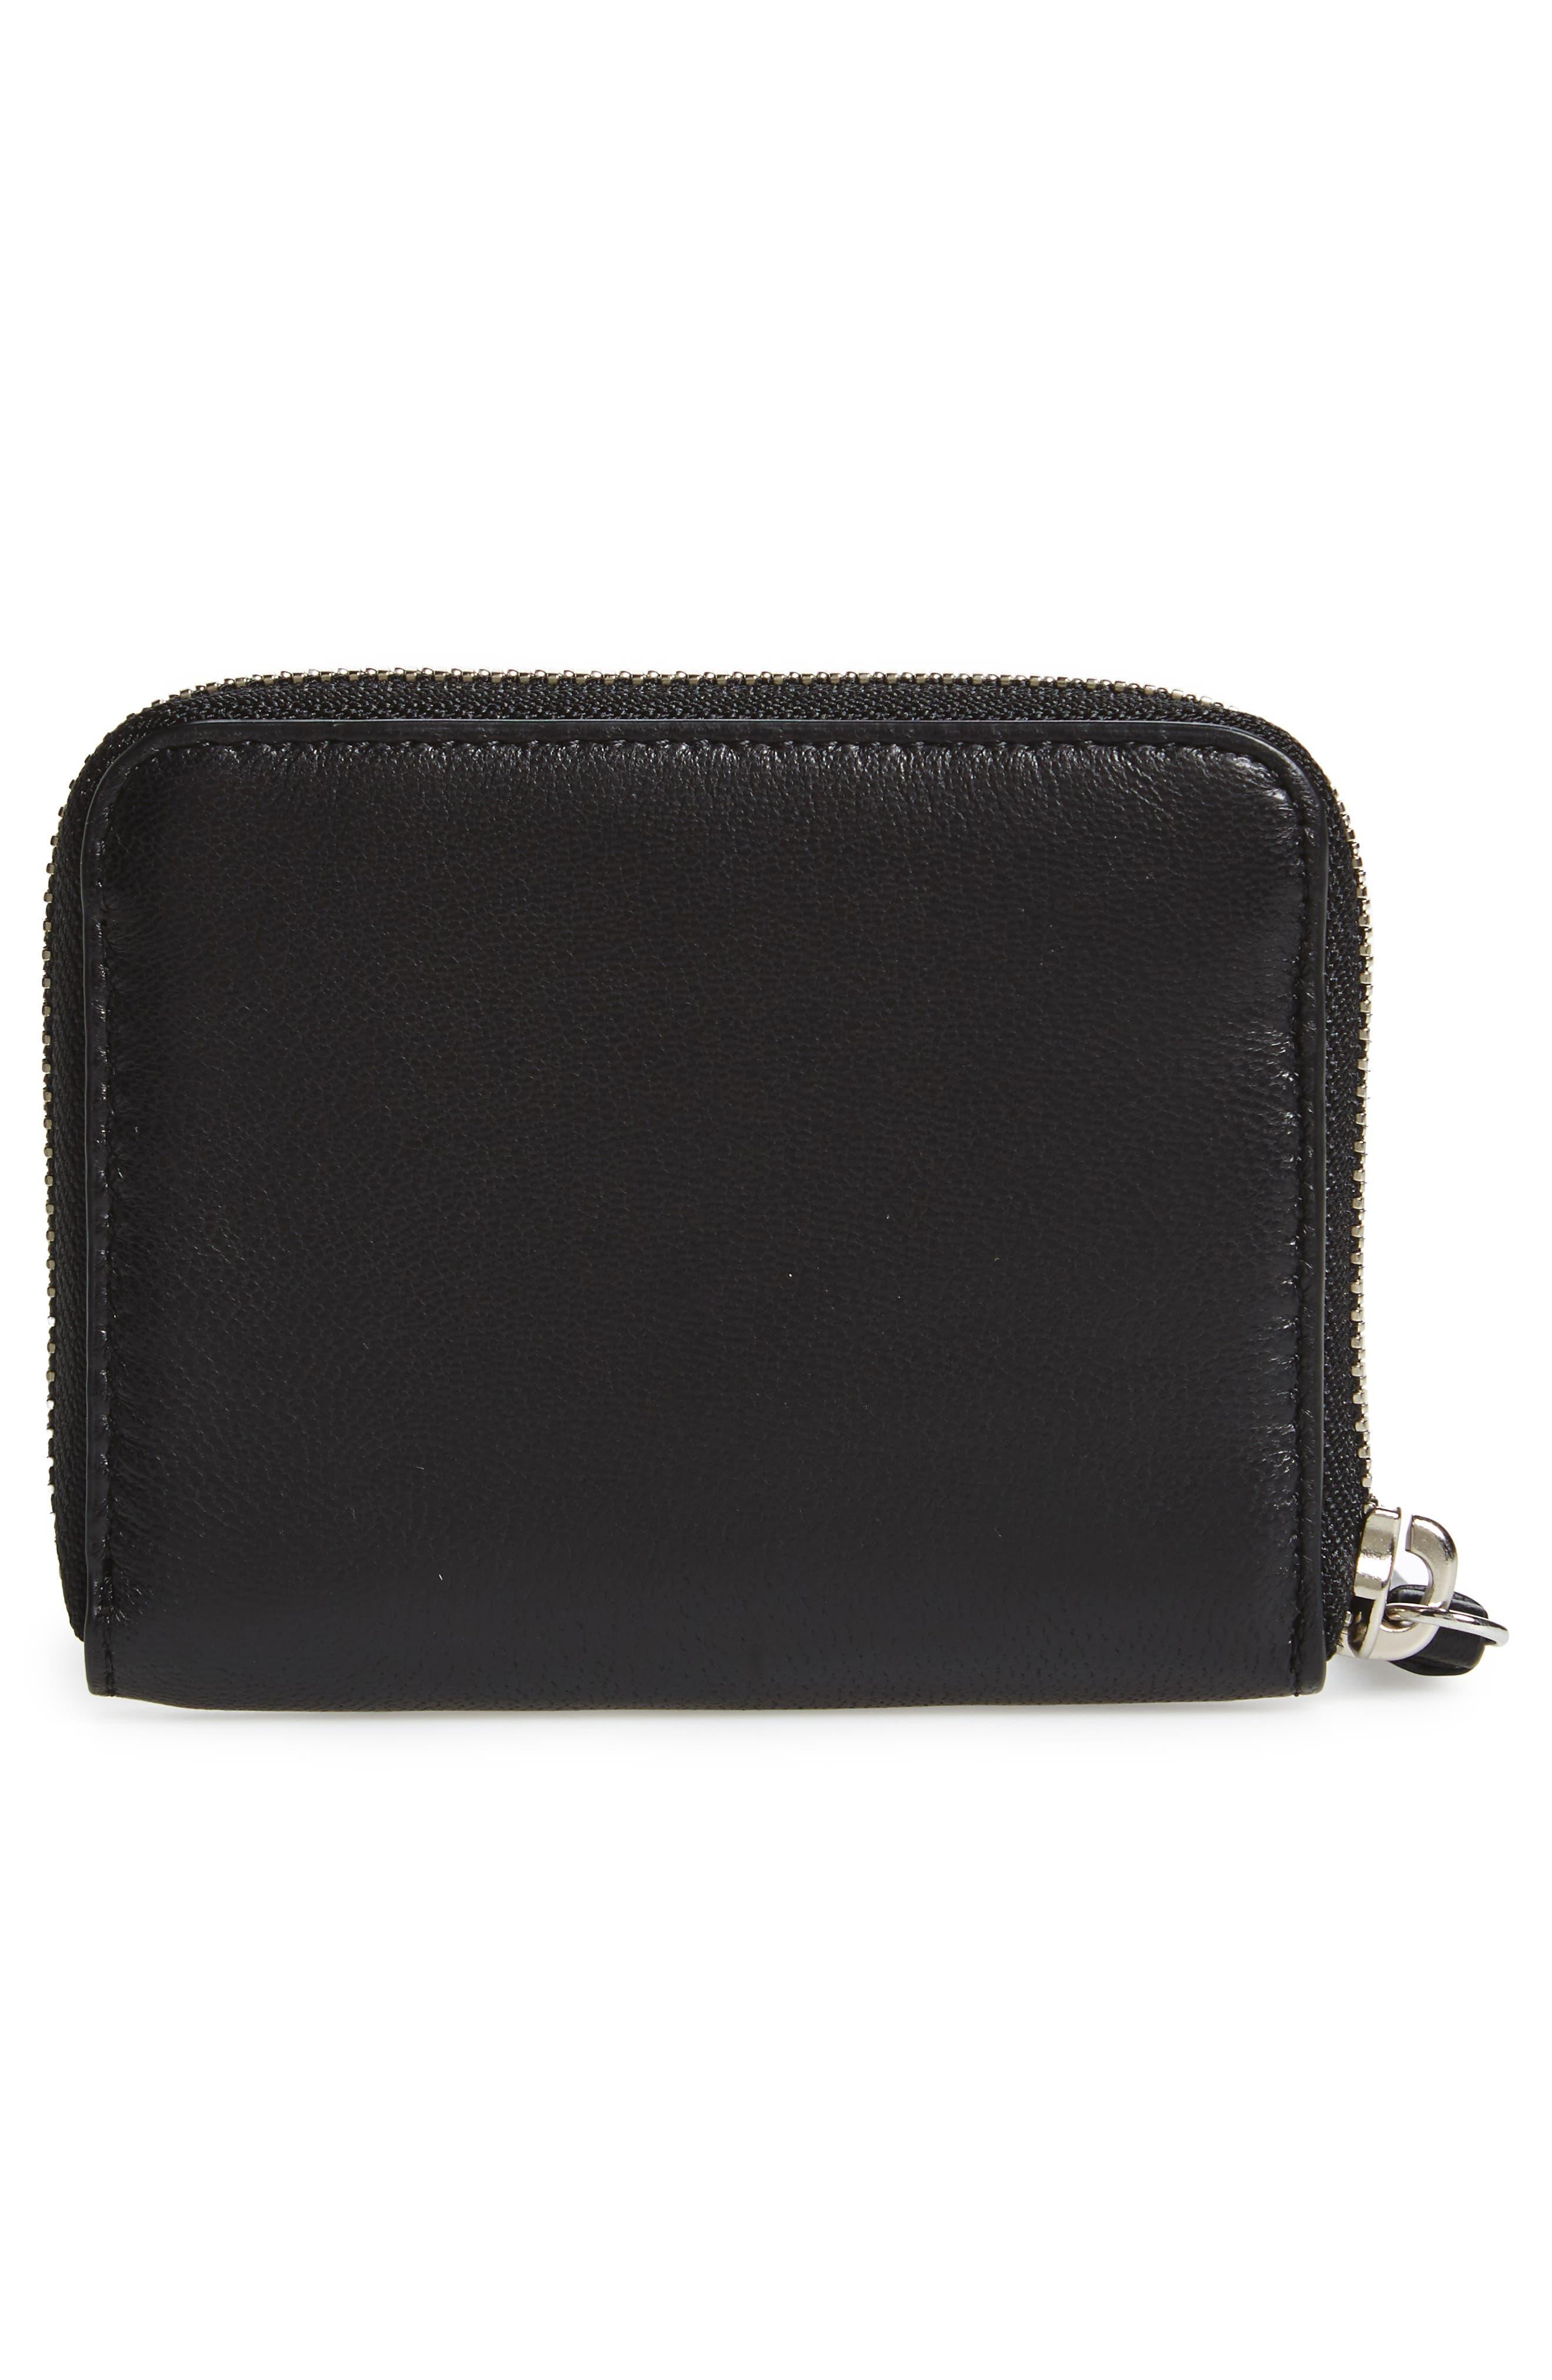 Kanda Mini Zip Wallet,                             Alternate thumbnail 4, color,                             001